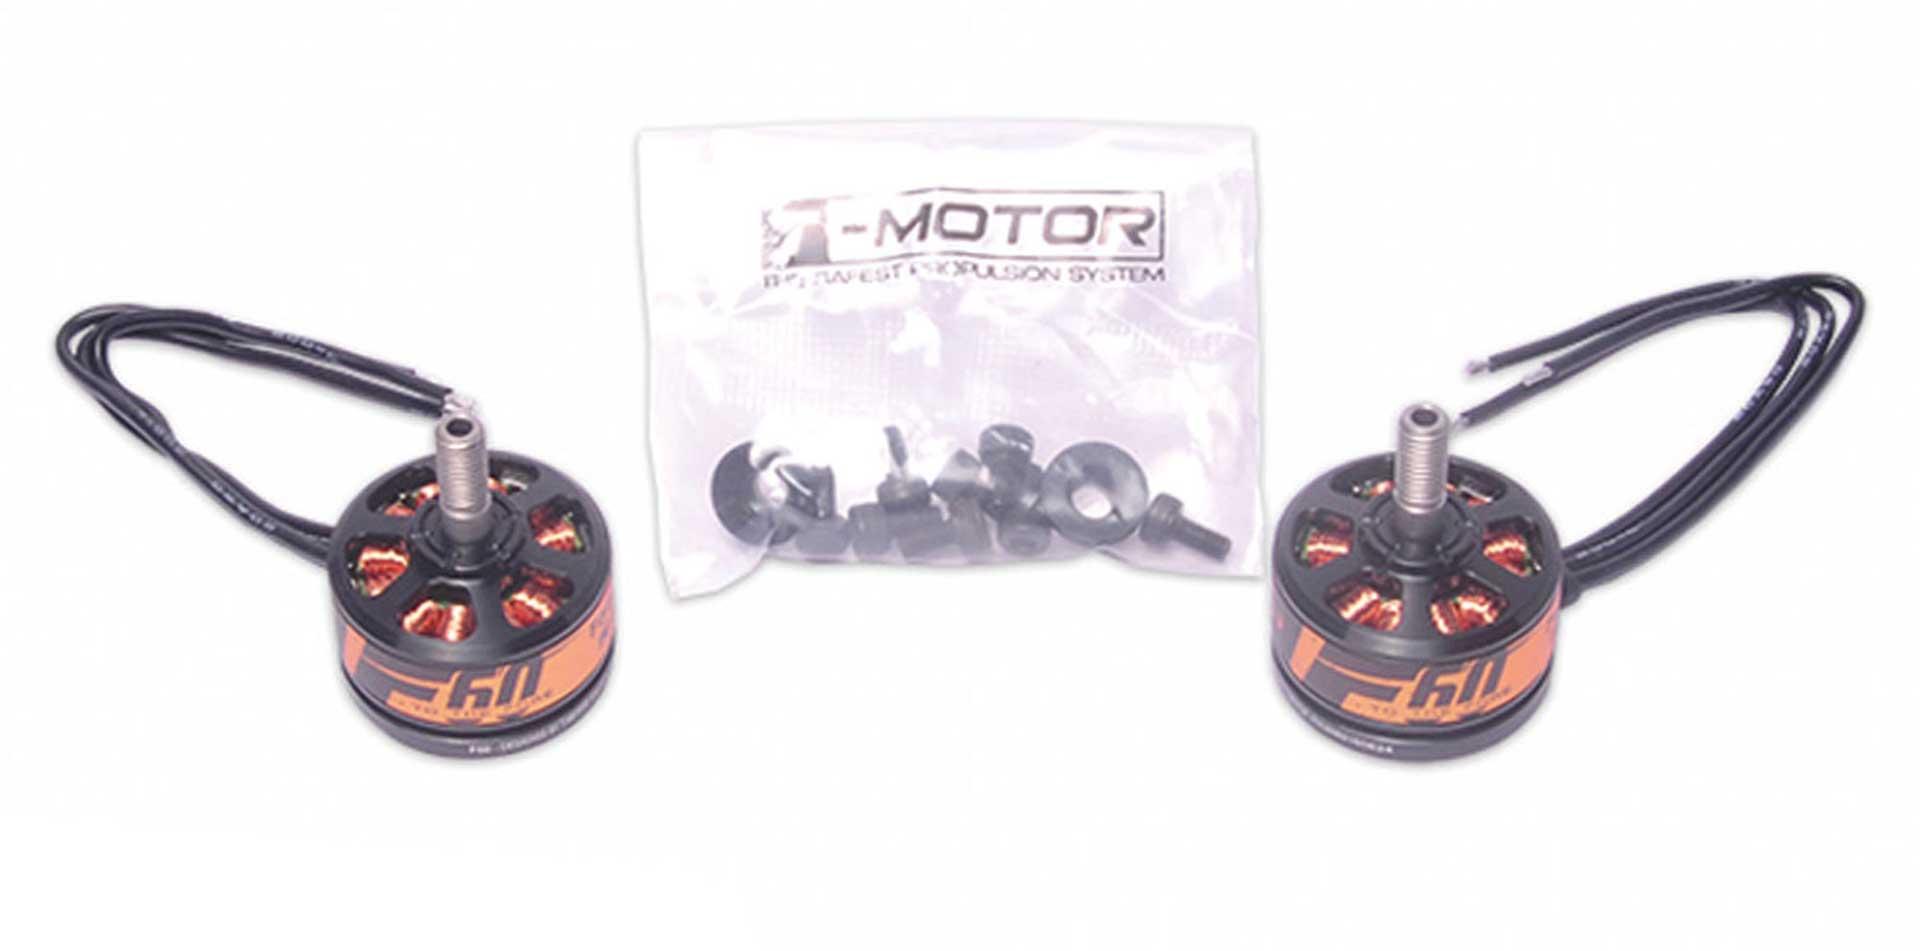 TIGER MOTOR T-MOTOR FPV SERIES F60 2450 KV 2PCS.